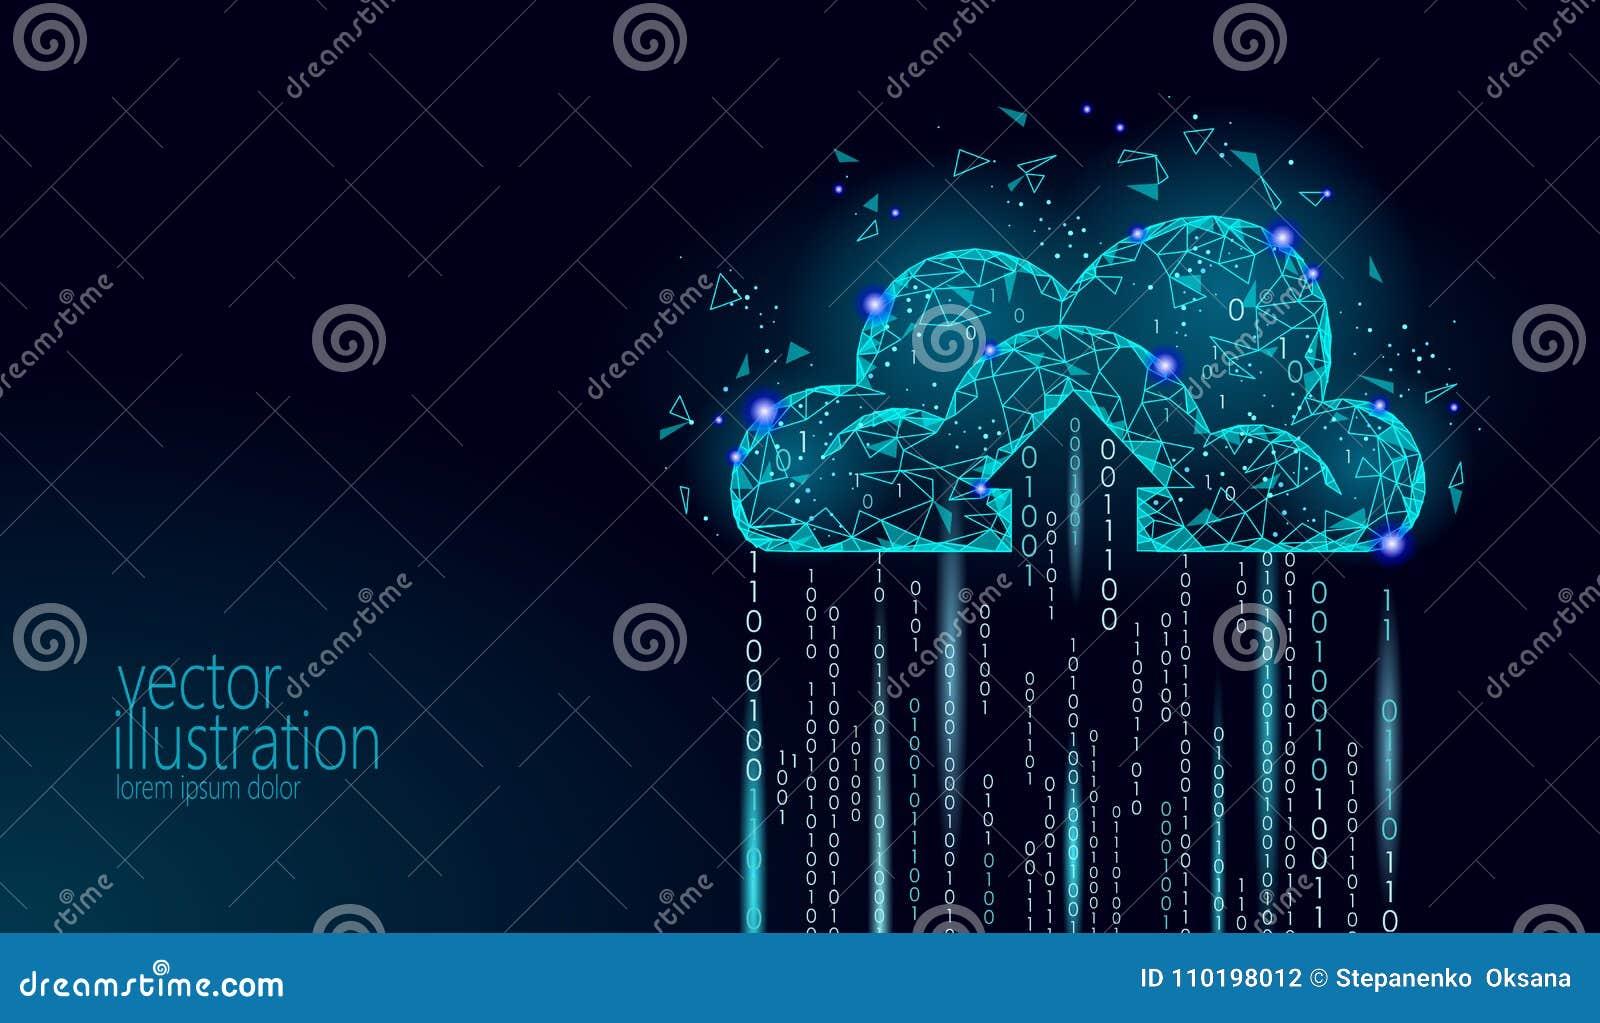 Cloud computing online storage low poly. Polygonal future modern internet business technology. Blue glowing global data